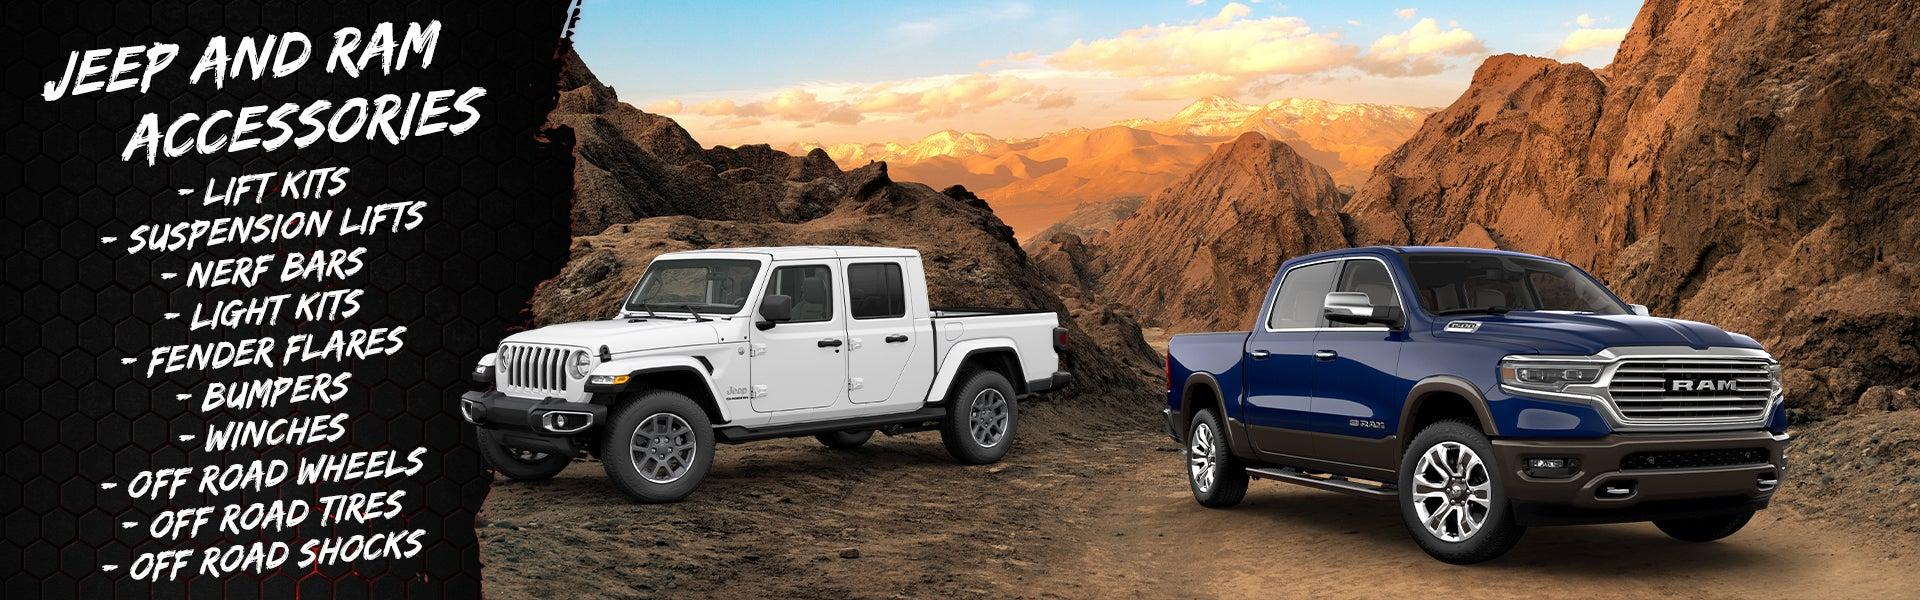 Lifted Trucks Jeeps